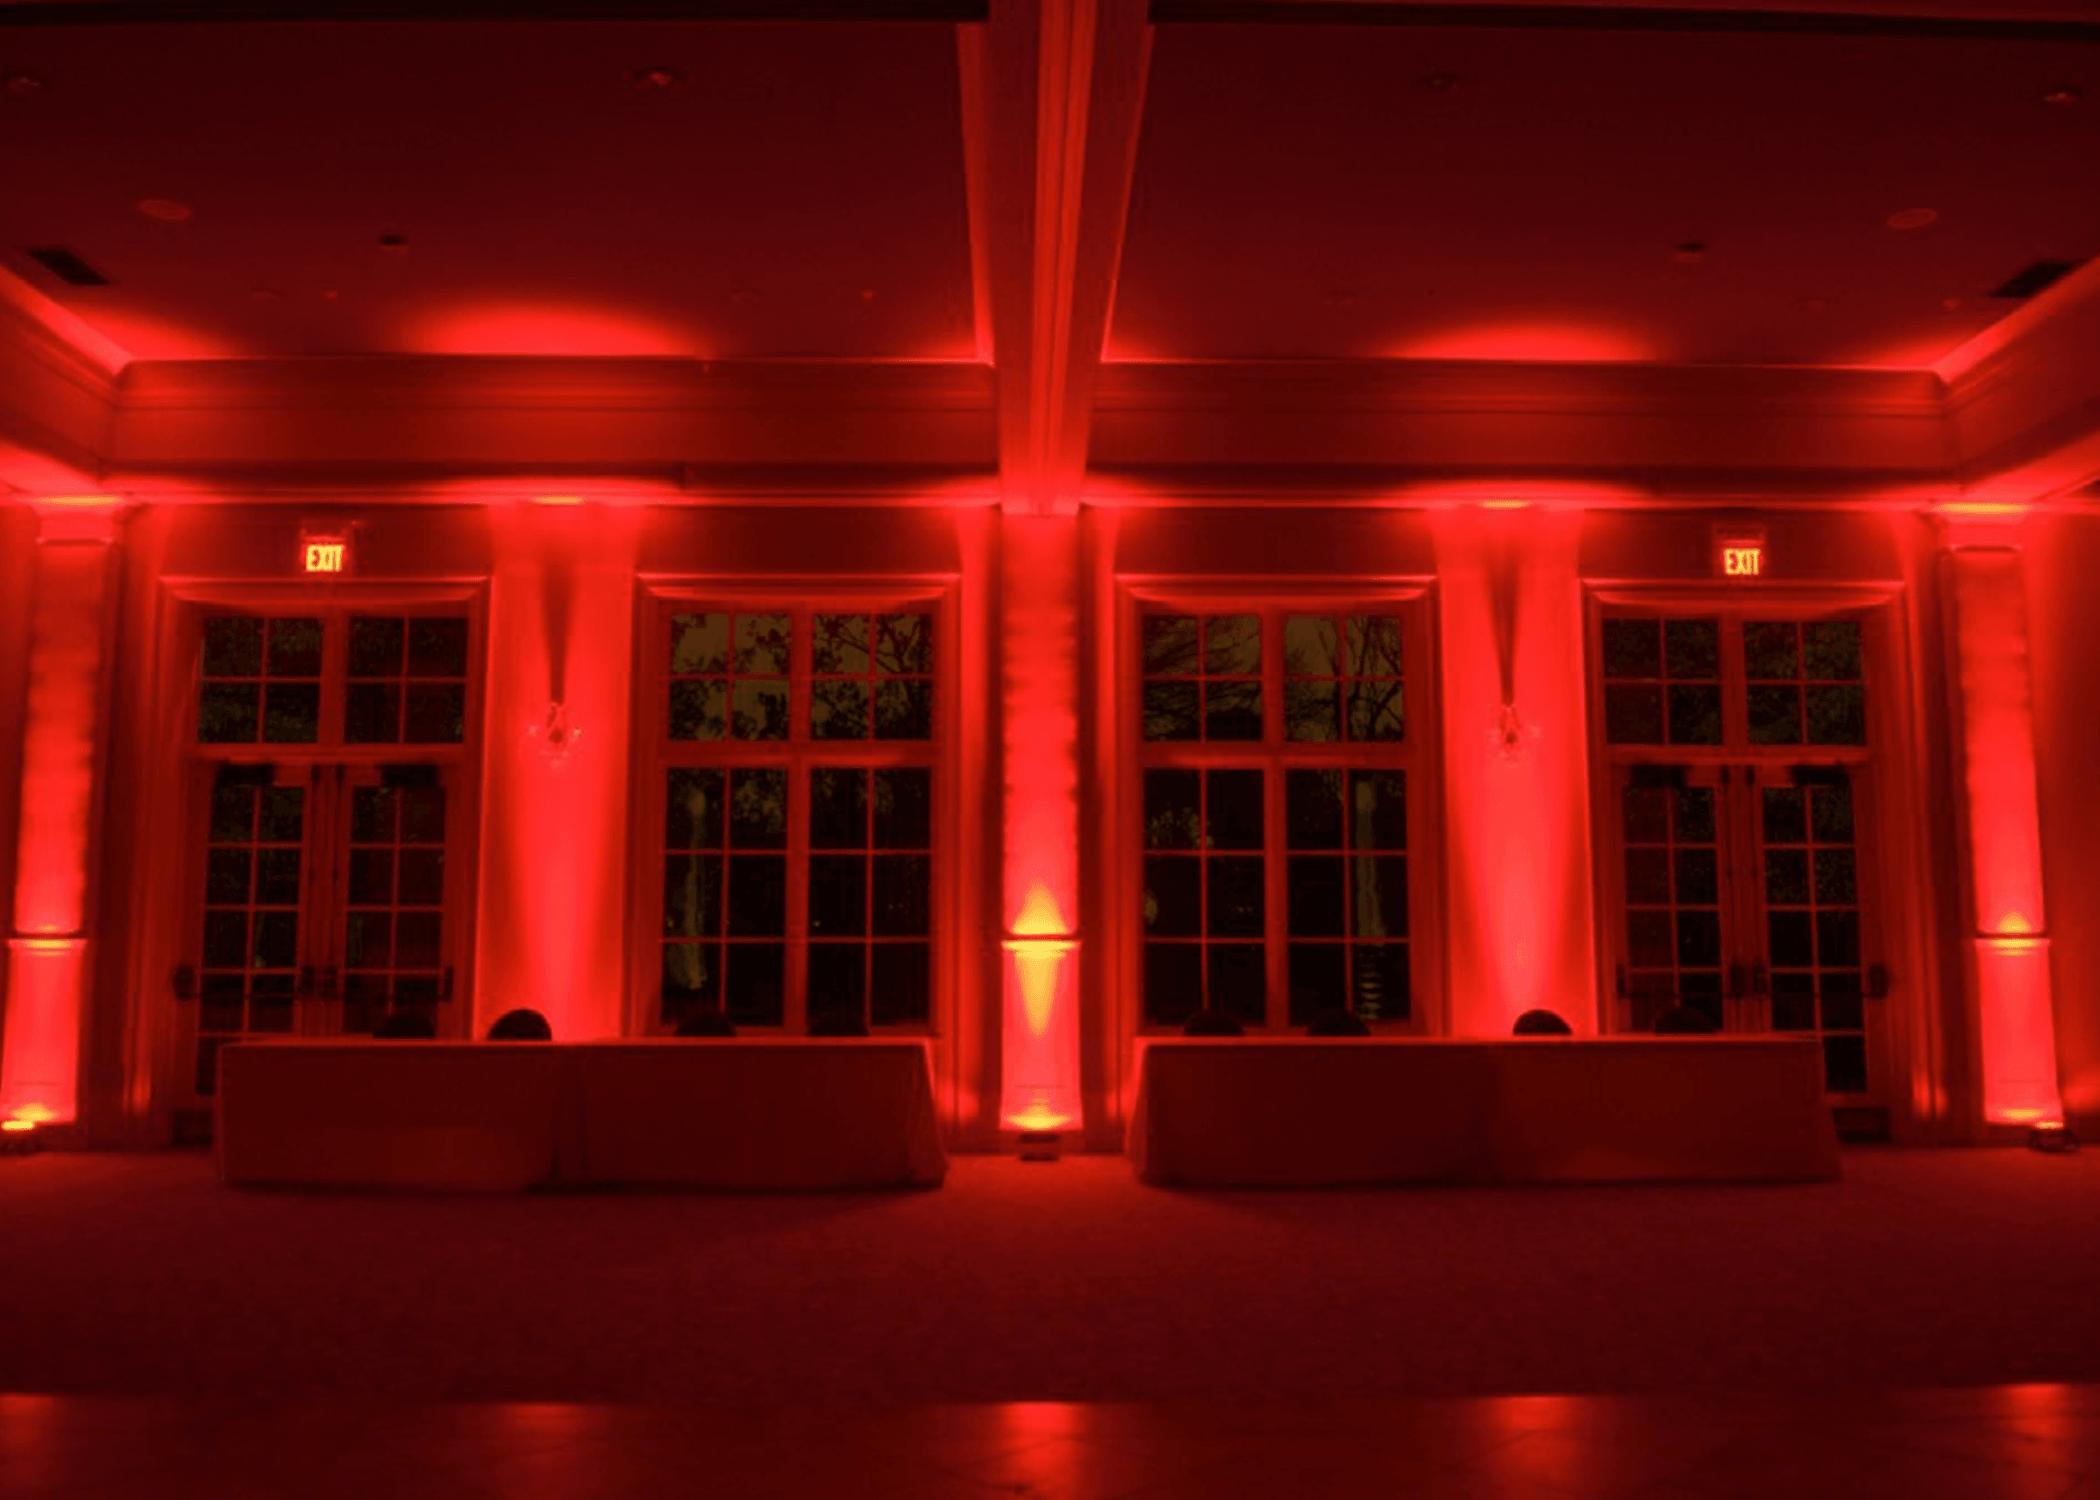 uplights-red